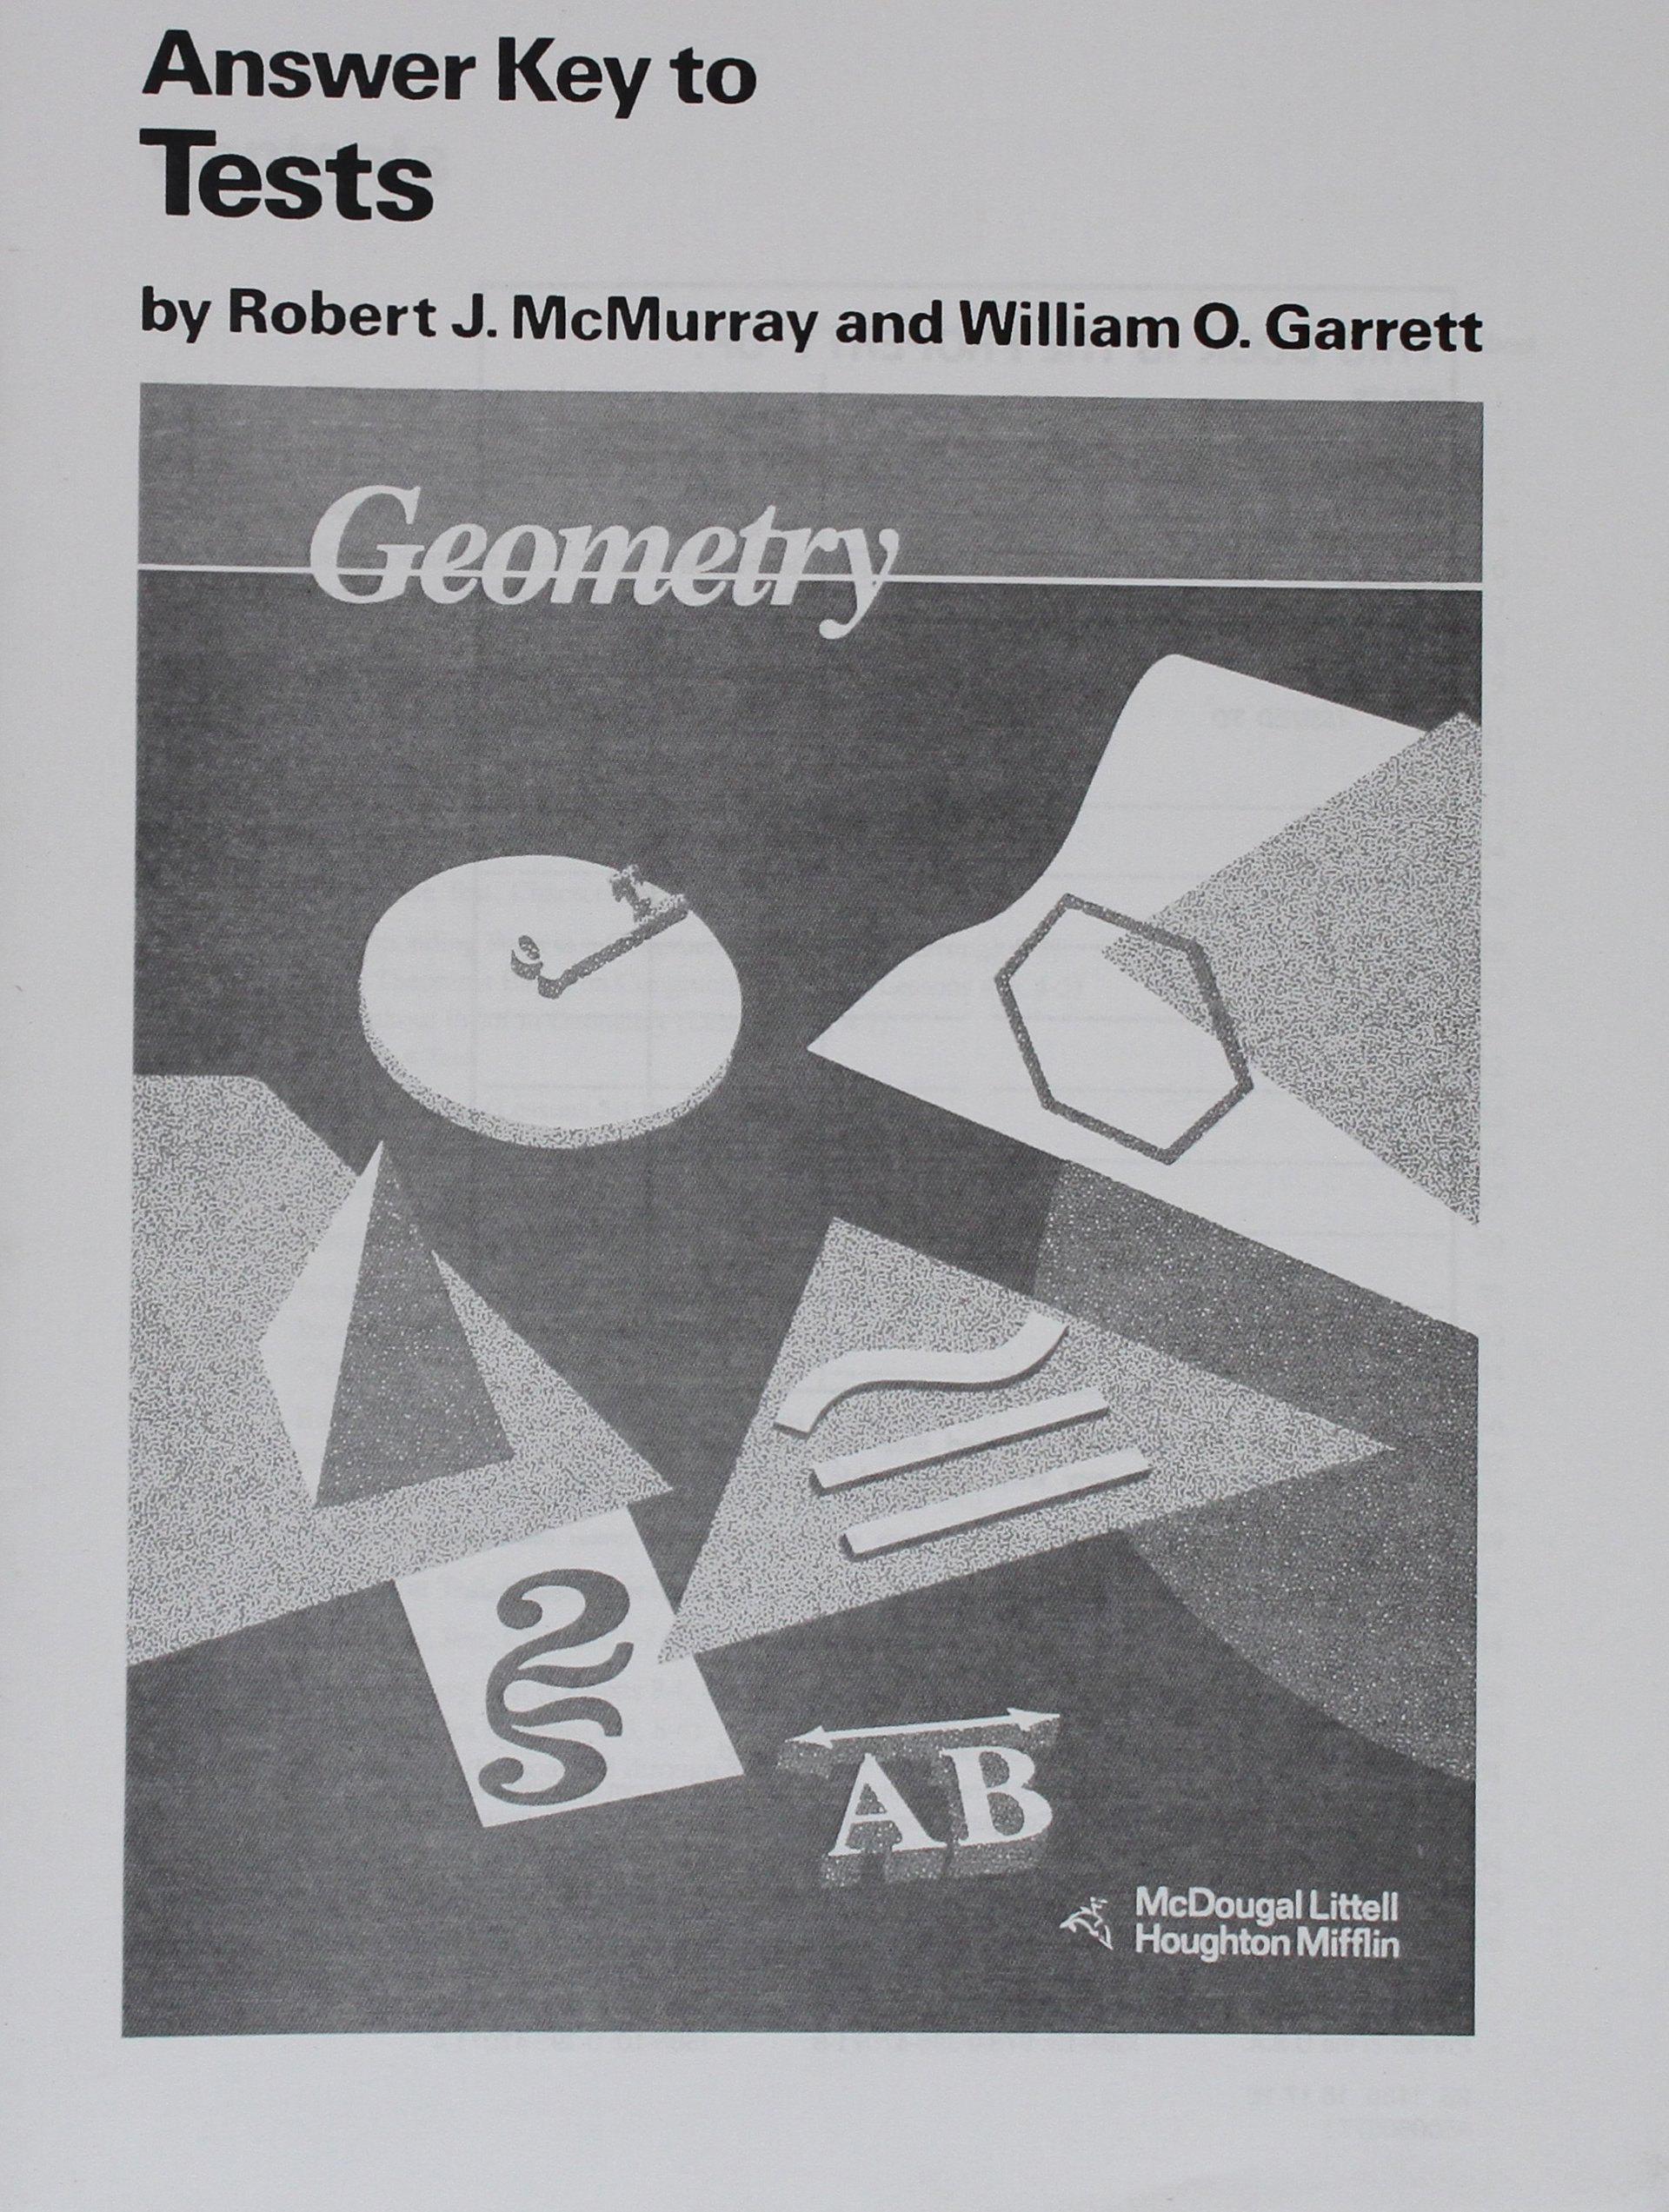 Amazon geometry answer key tests 9780395470718 robert j amazon geometry answer key tests 9780395470718 robert j mcmurray books fandeluxe Choice Image